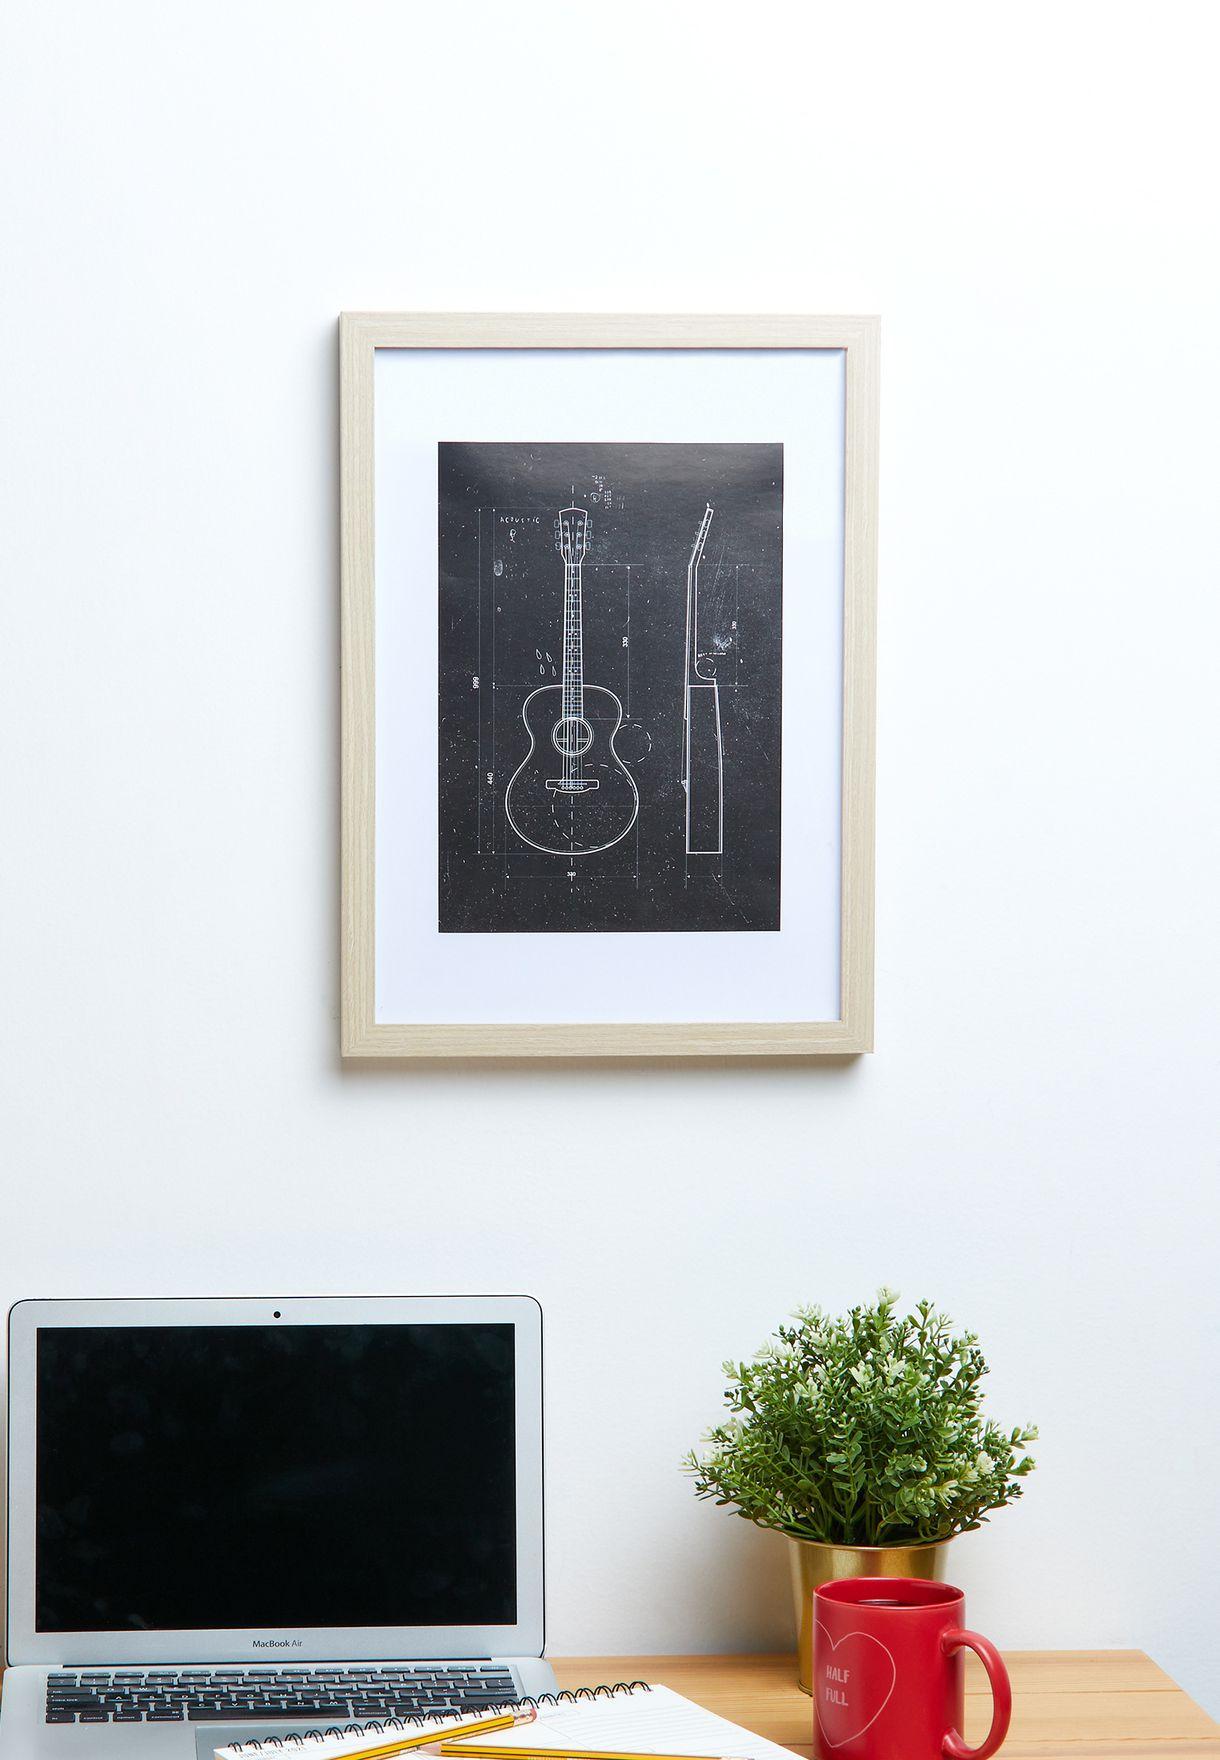 A4 Framed Art